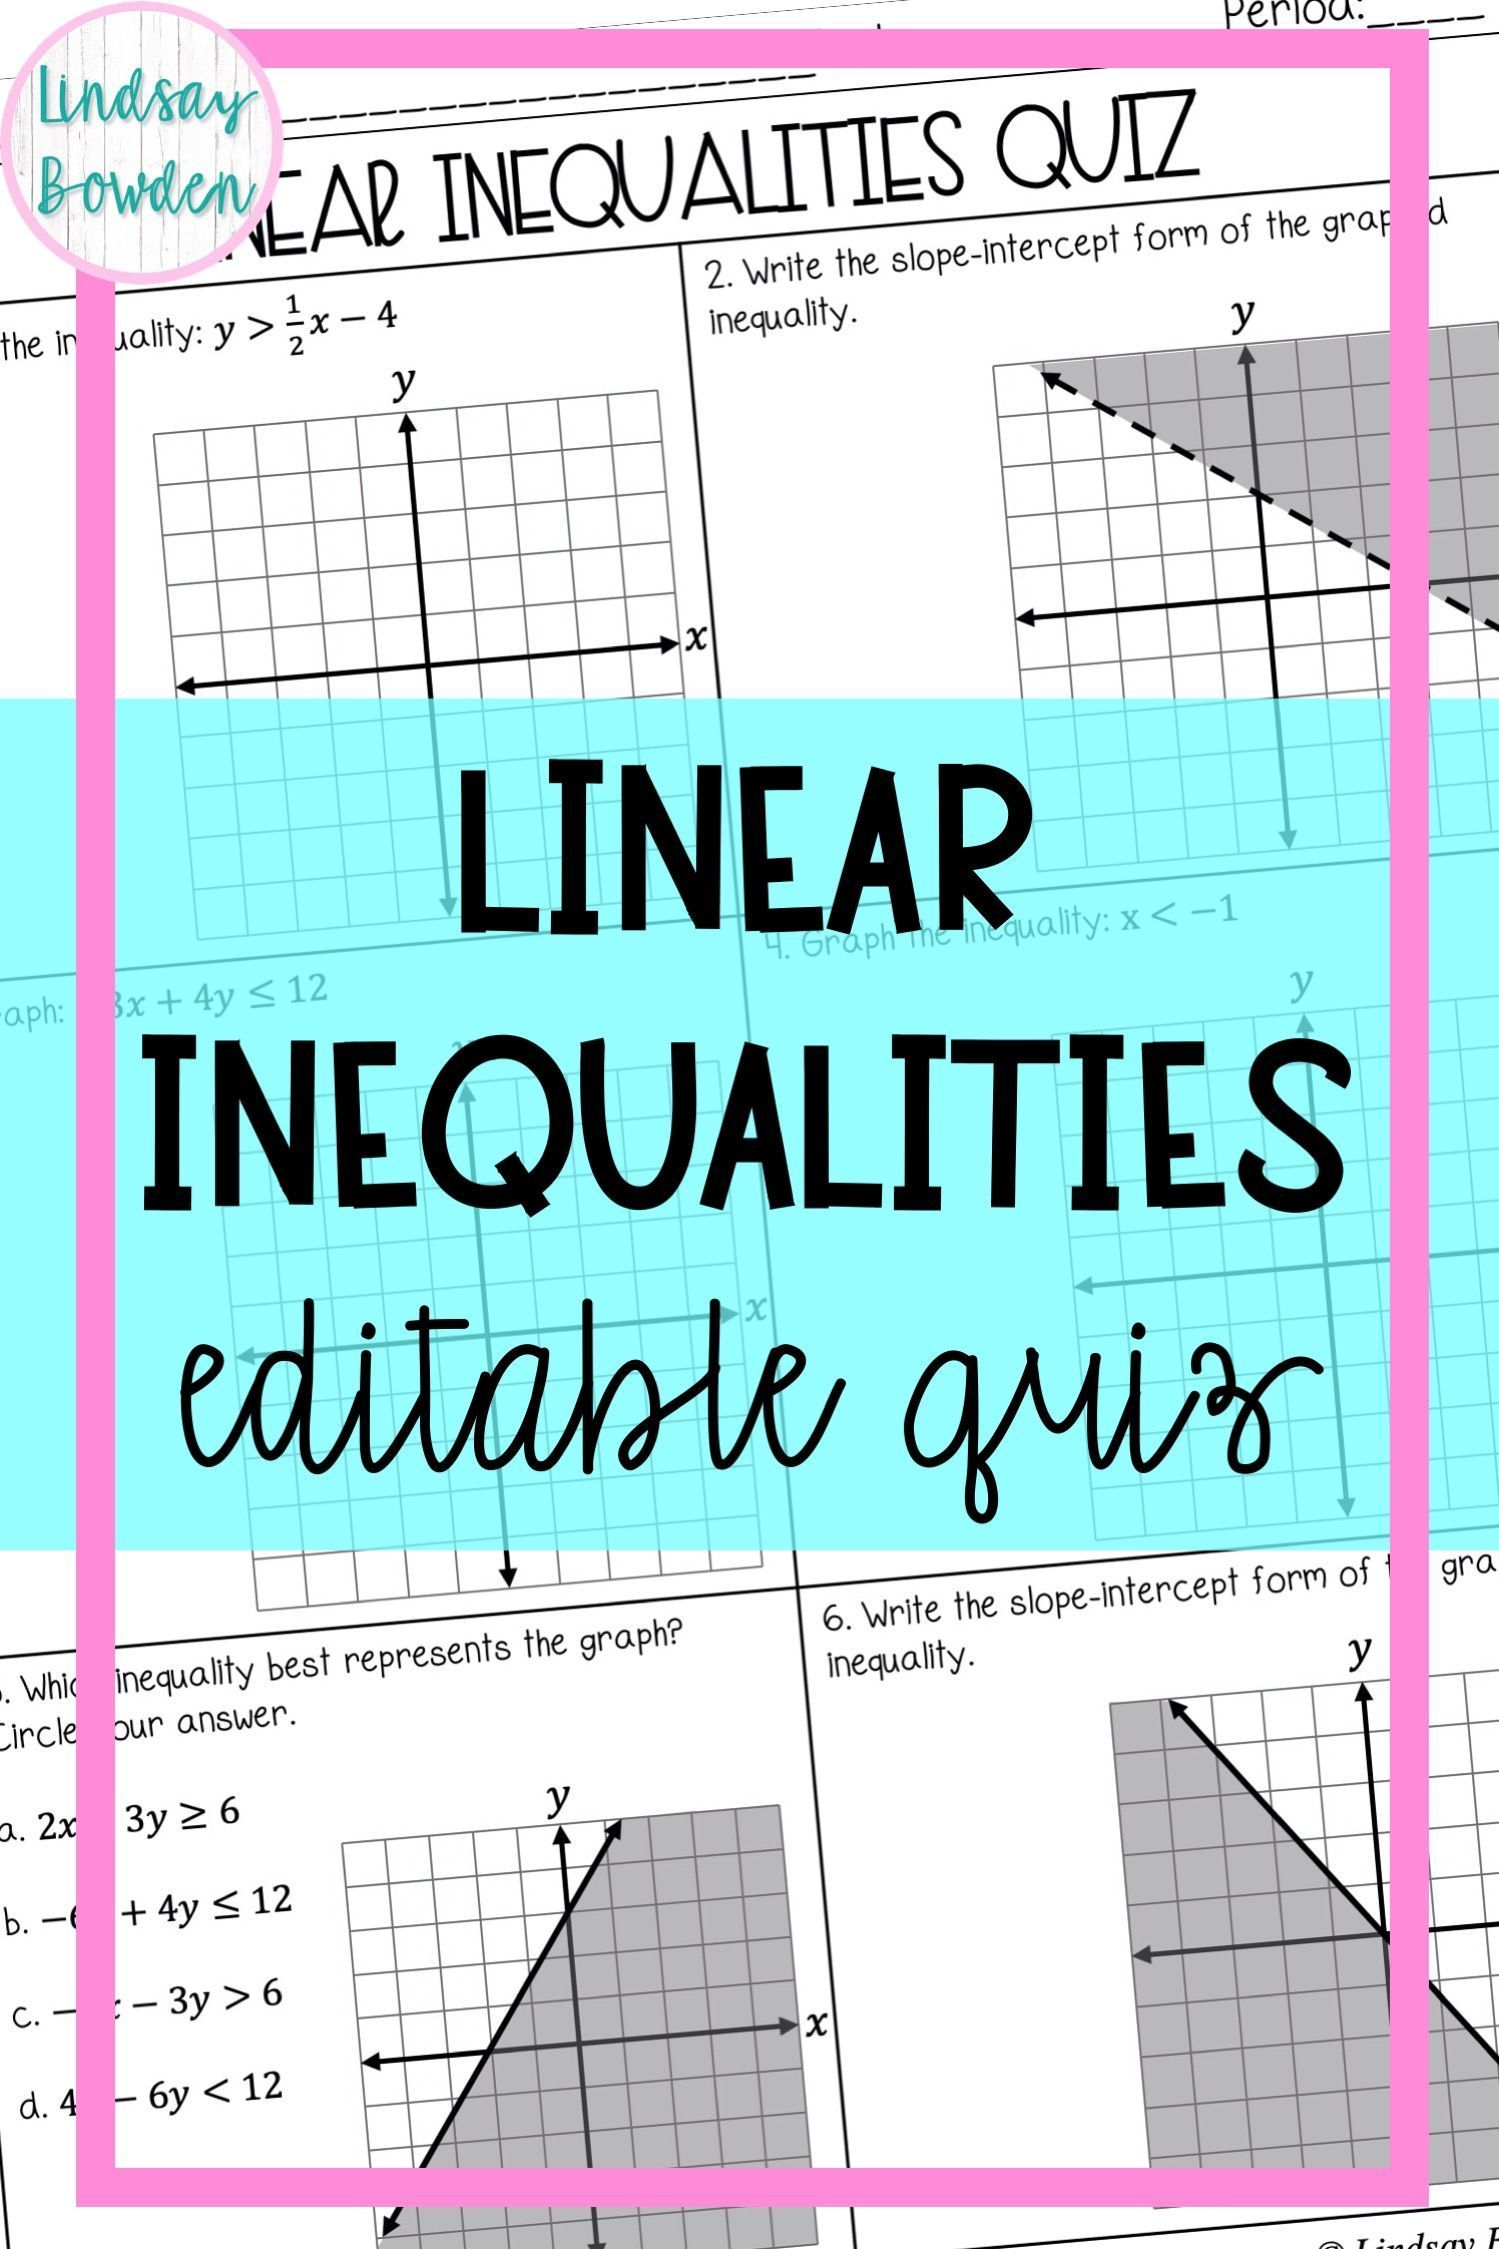 Linear Inequalities Quiz Writing Inequalities Graphing Linear Inequalities Linear Inequalities